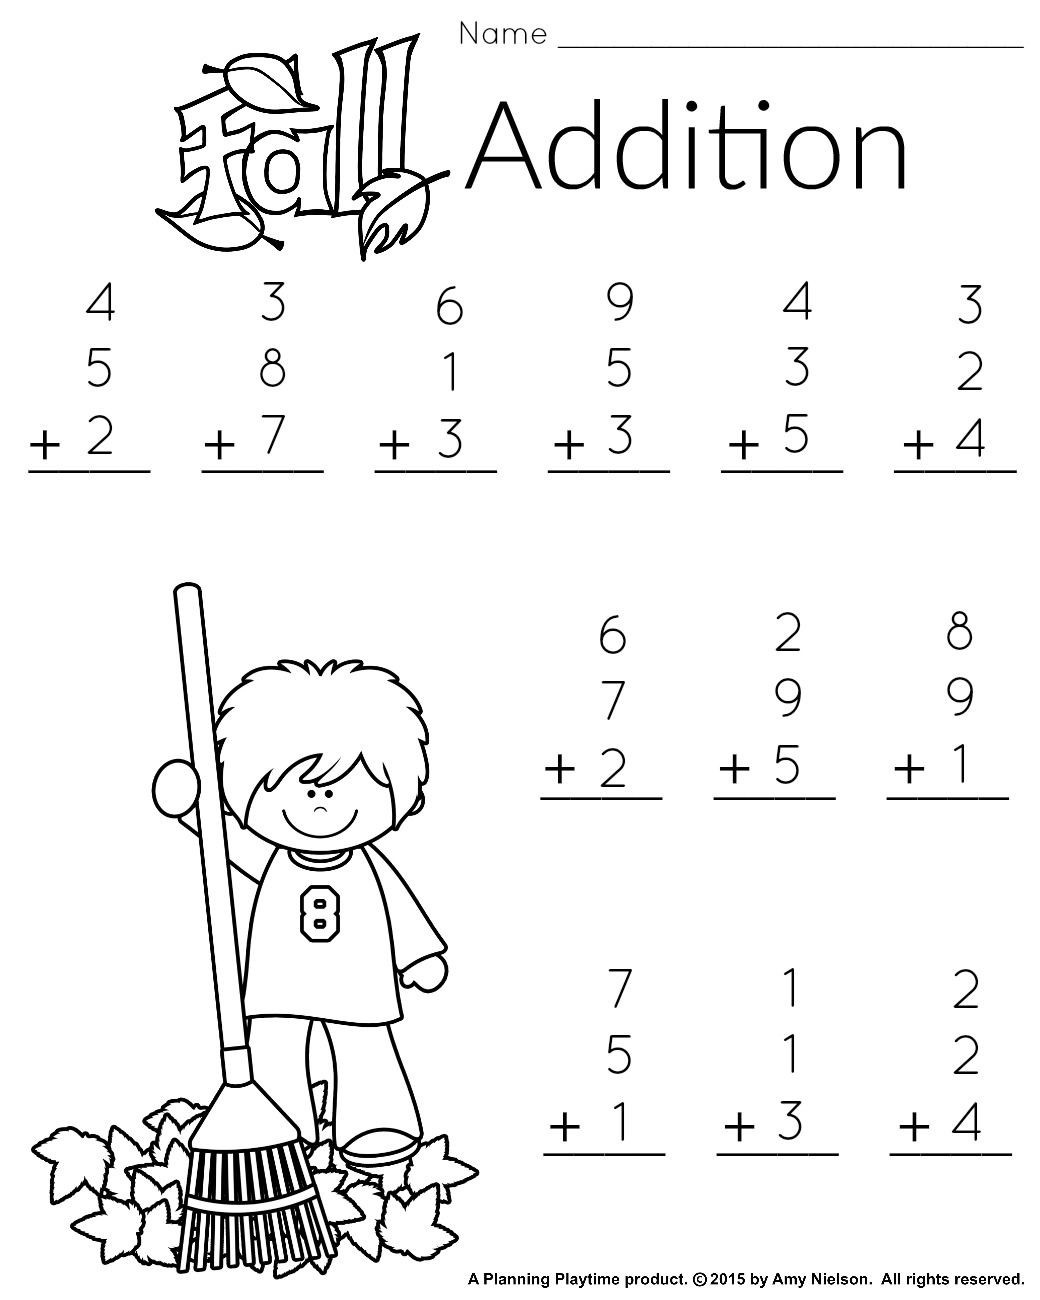 Addition Practice For 1st Grade Worksheets